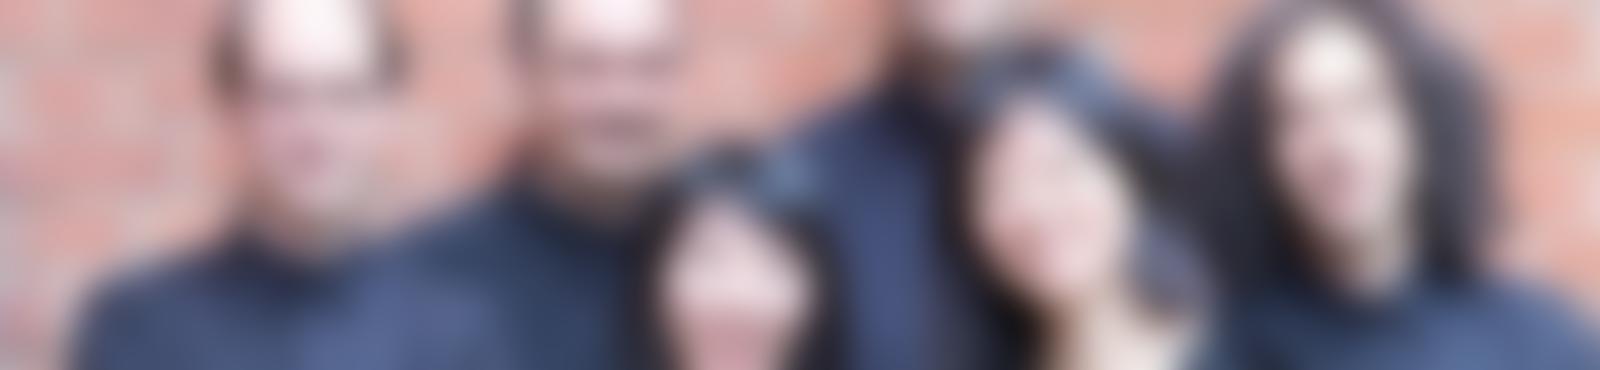 Blurred 1c0115ae 14cd 40d5 acc6 125c10d170e2